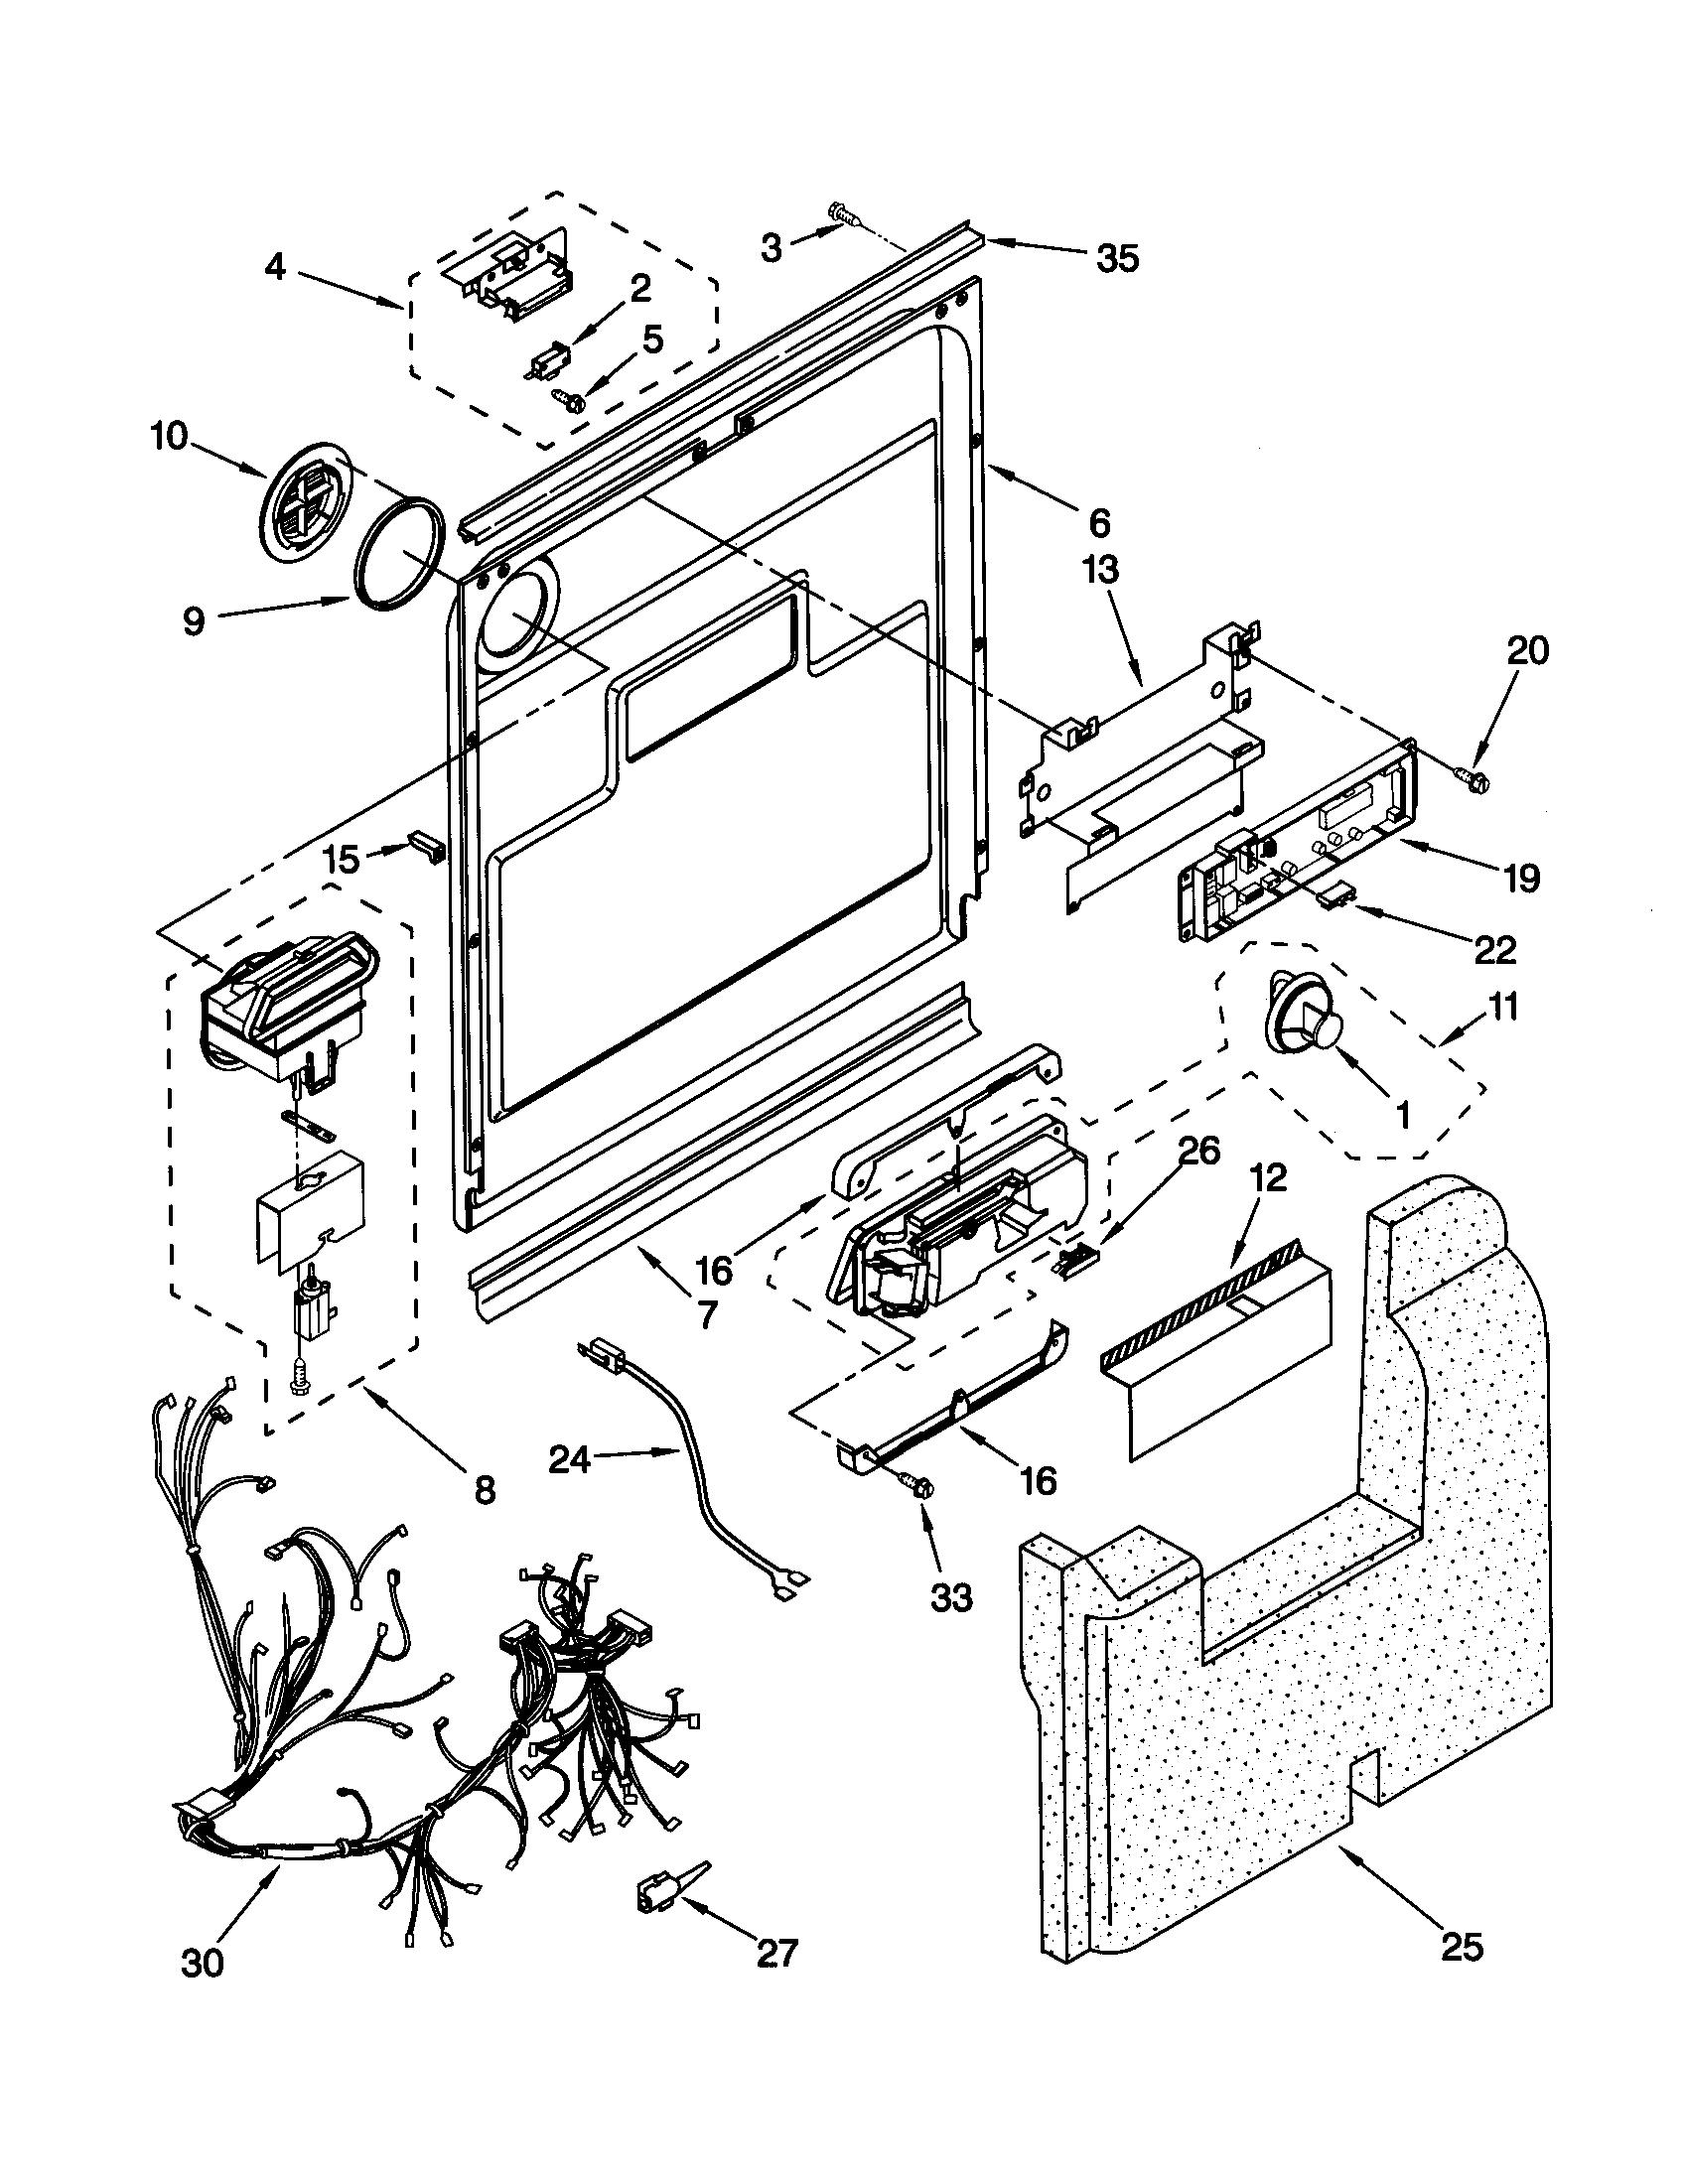 Images of Kenmore Dishwasher Wiring Diagram - Wiring diagram schematic